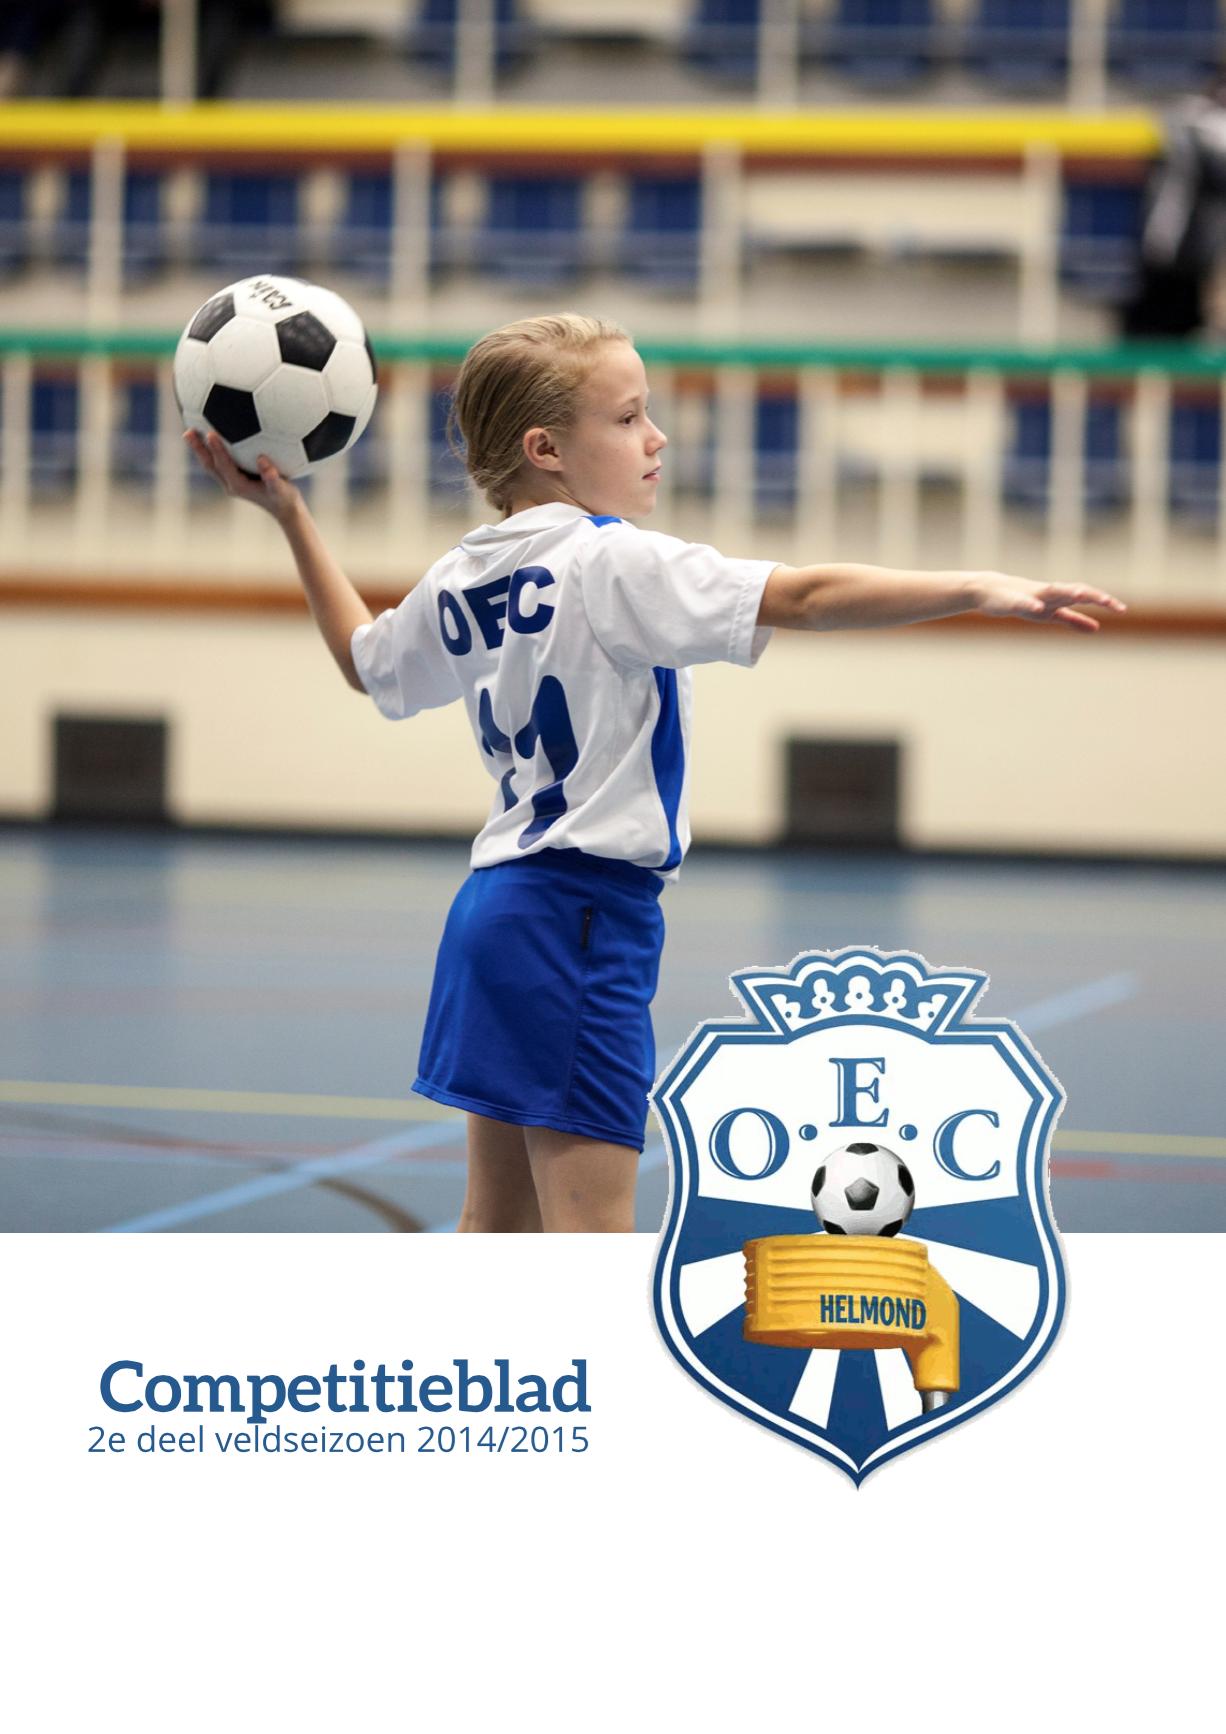 Competitieblad 2e Deel Veld 2014/2015